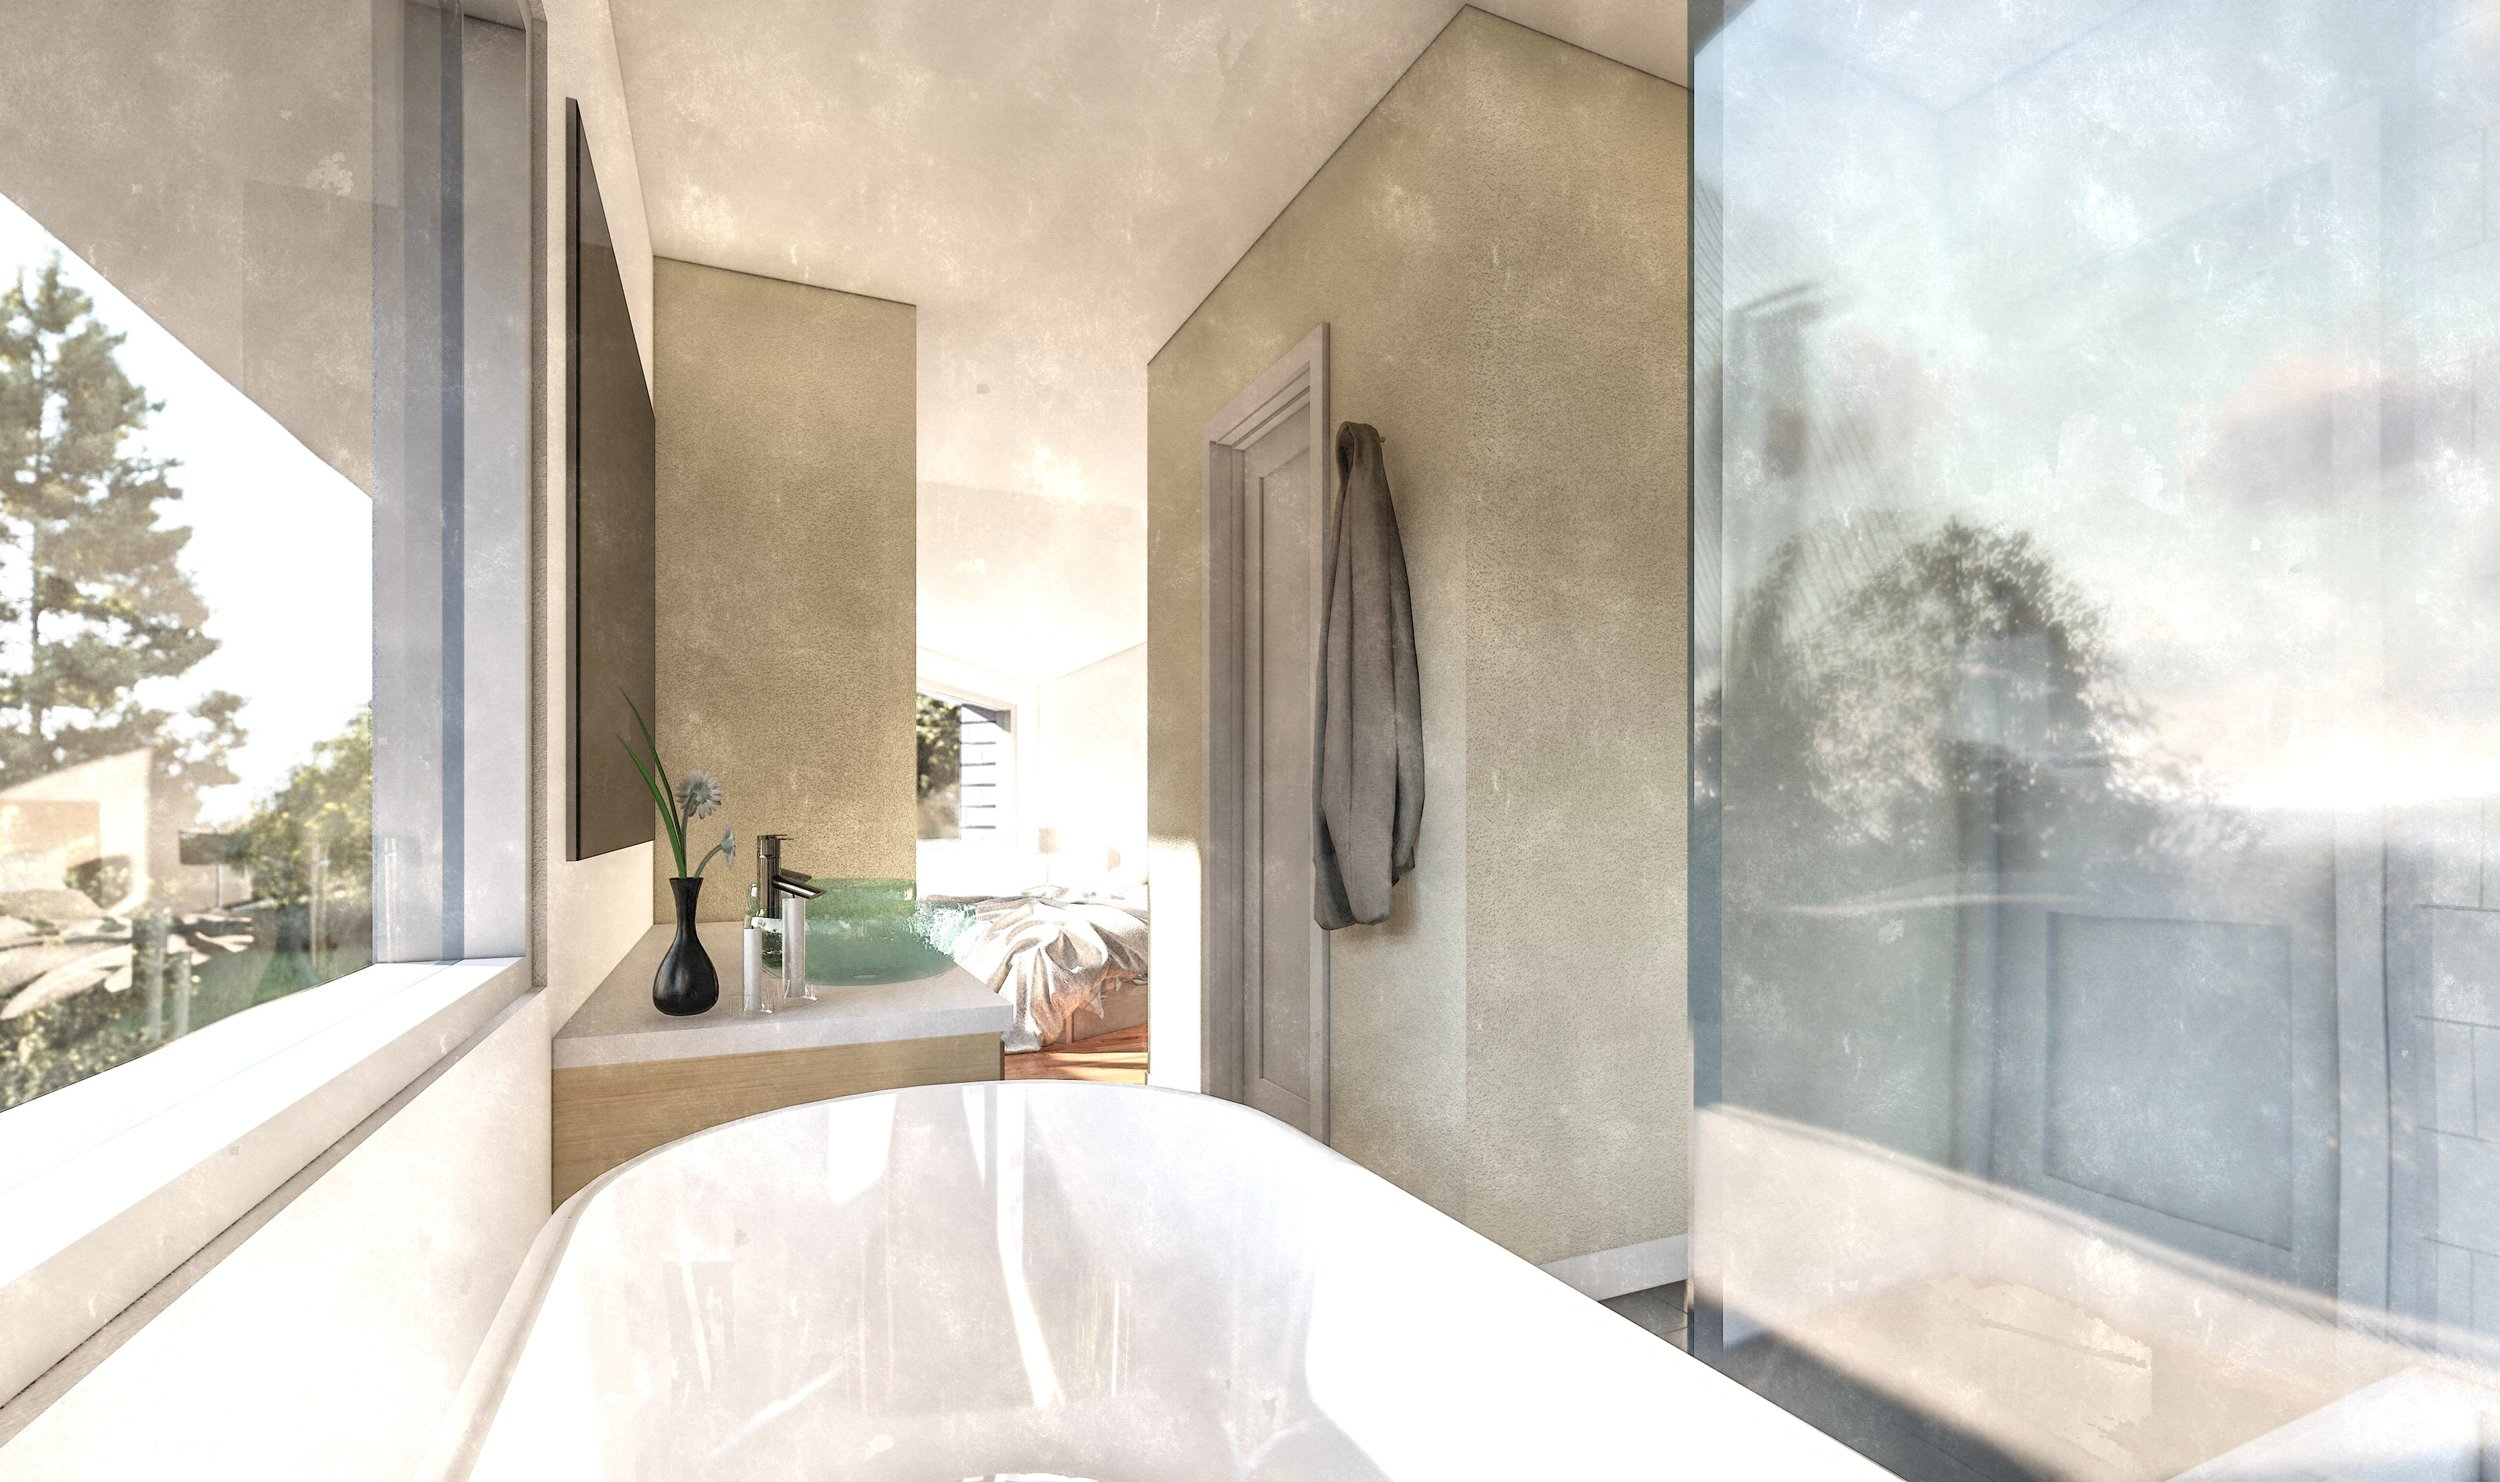 MidCentury Master Suite__Option 1 - Bathroom 2_FotoSketcher.jpg